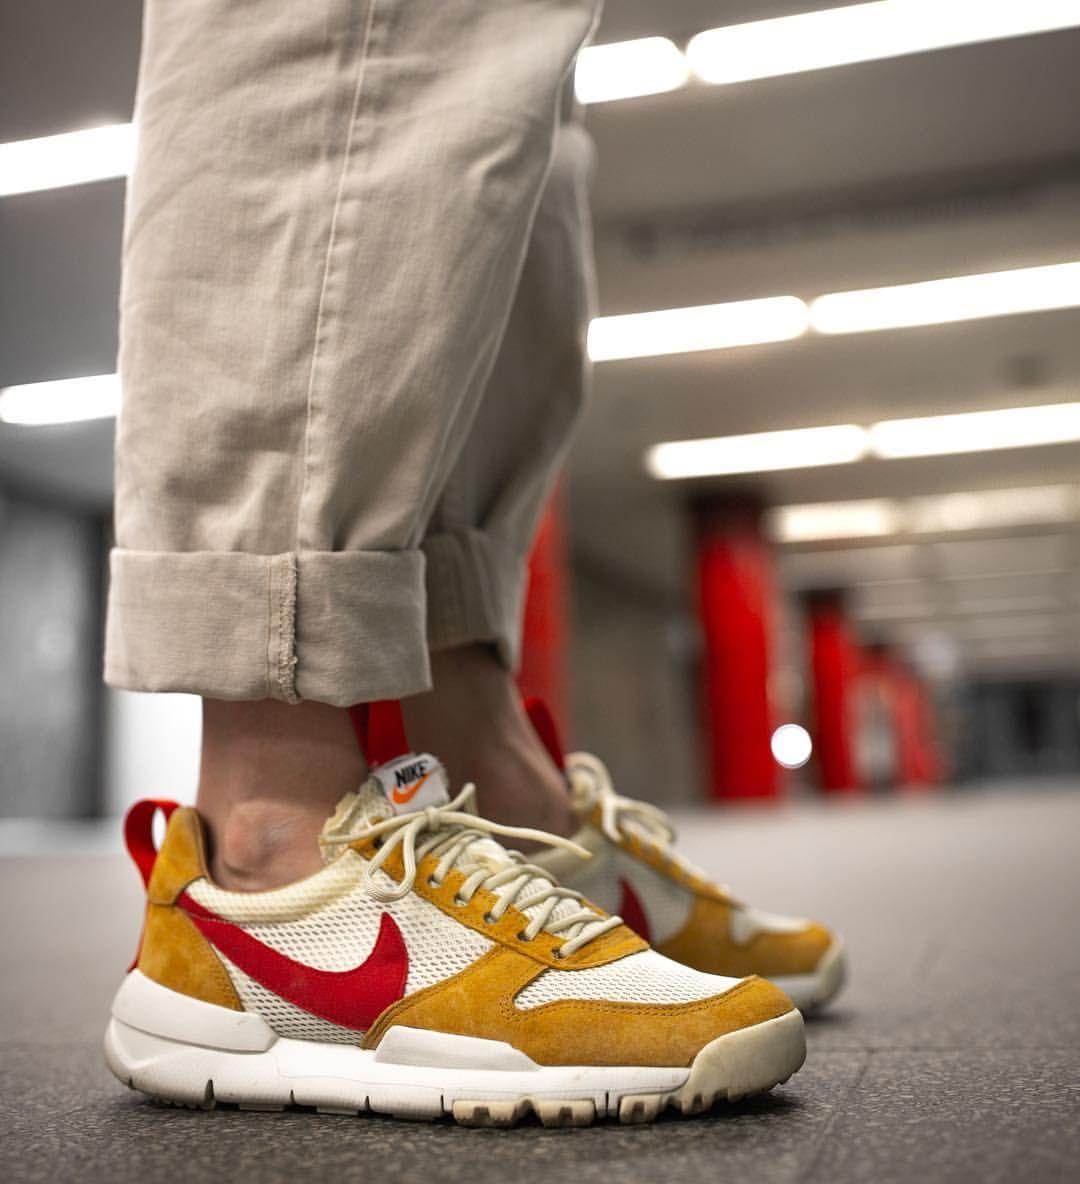 7bd789afb3 Tom Sachs x Nike Mars Yard 2.0 | Kicking it in 2019 | Shoes, Nike ...